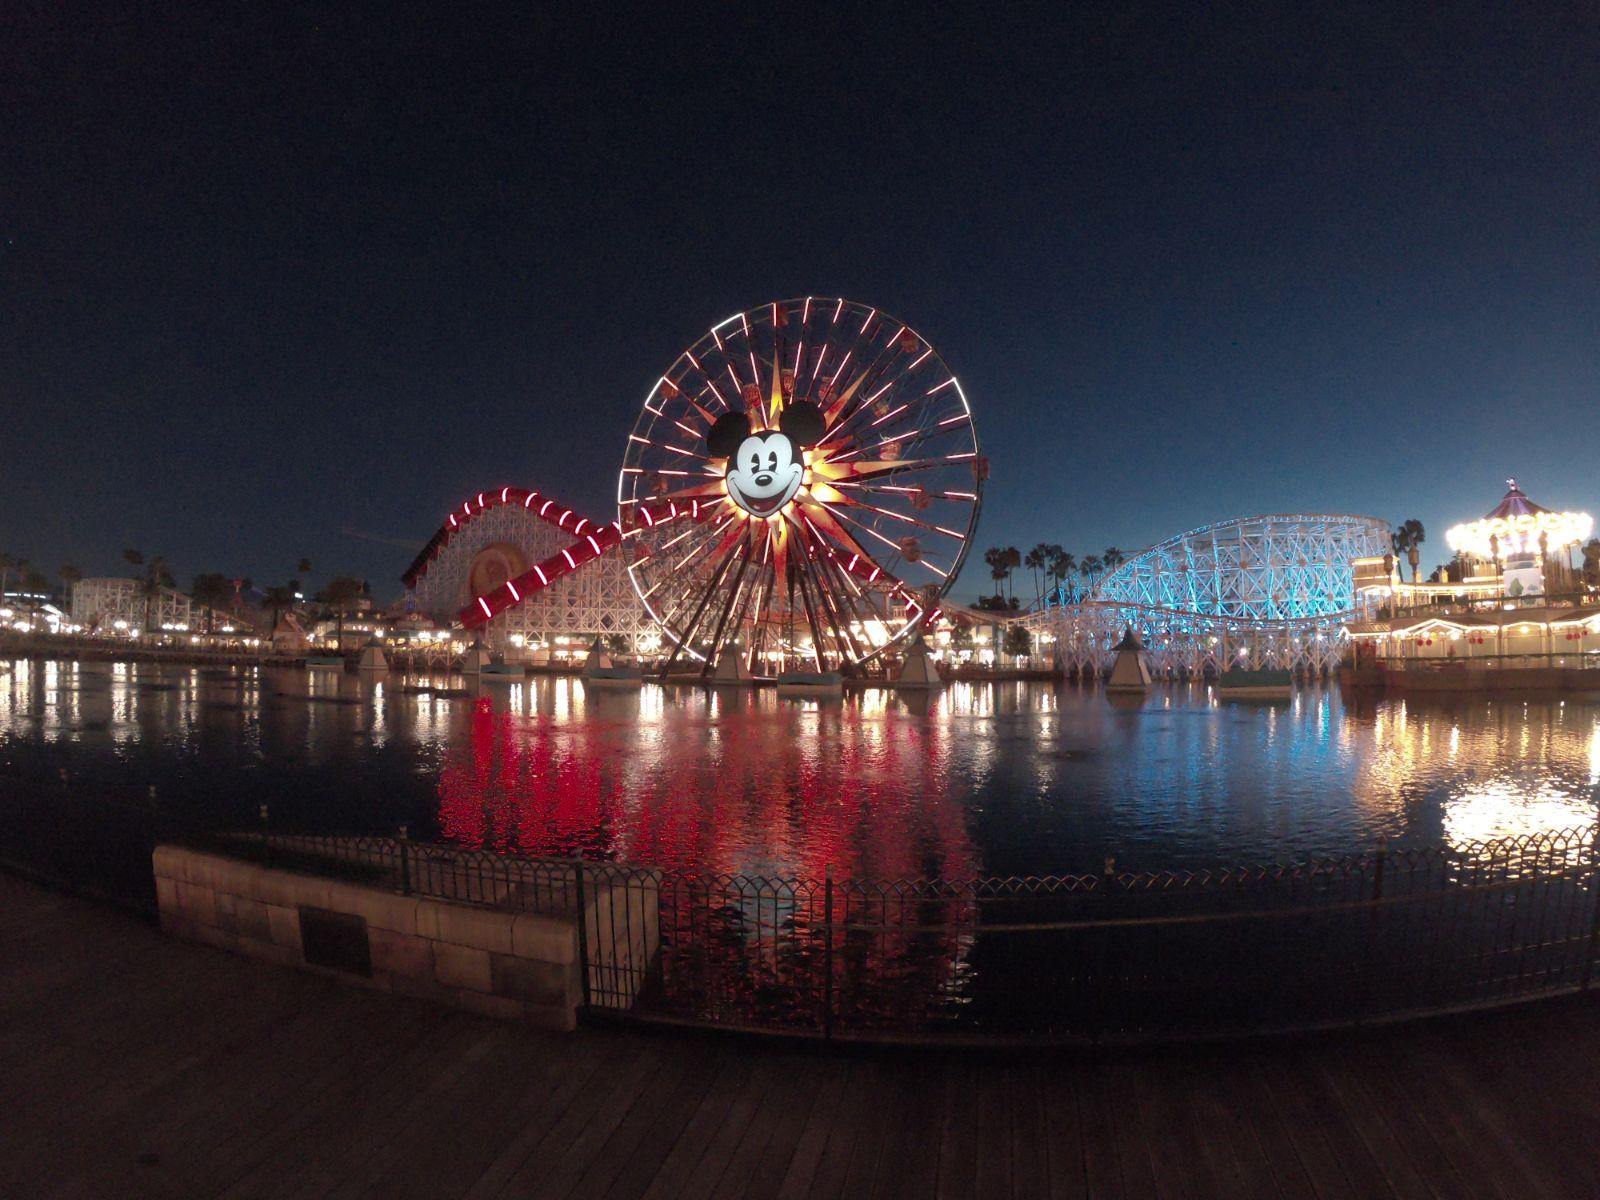 Disney fastpass tips